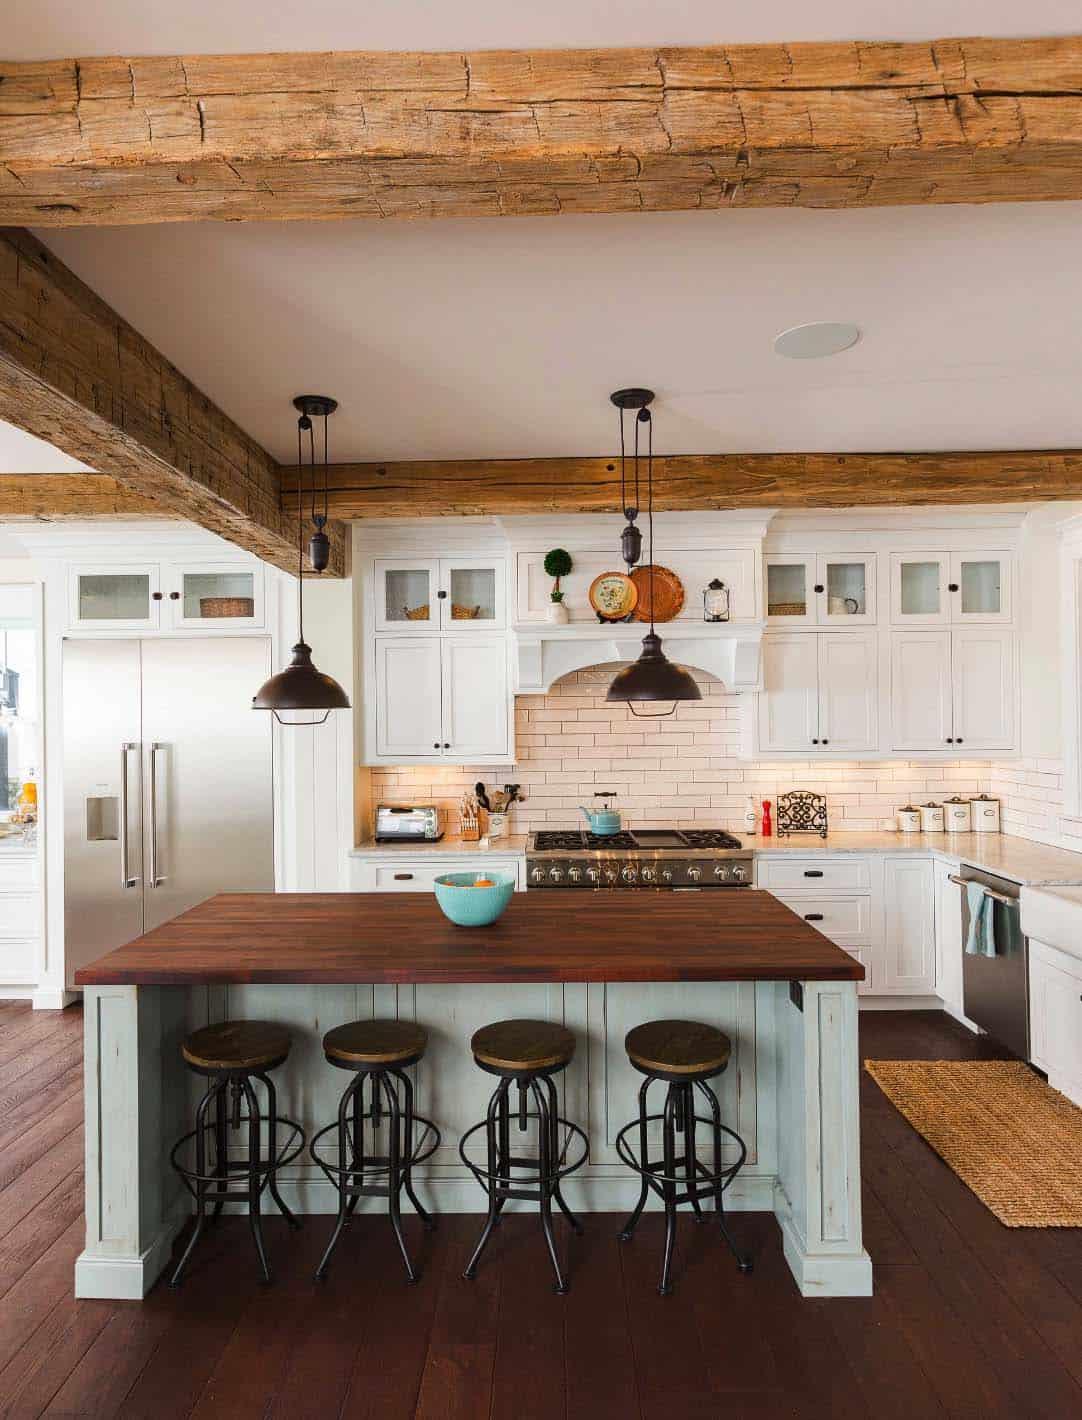 35 Amazingly Creative And Stylish Farmhouse Kitchen Ideas